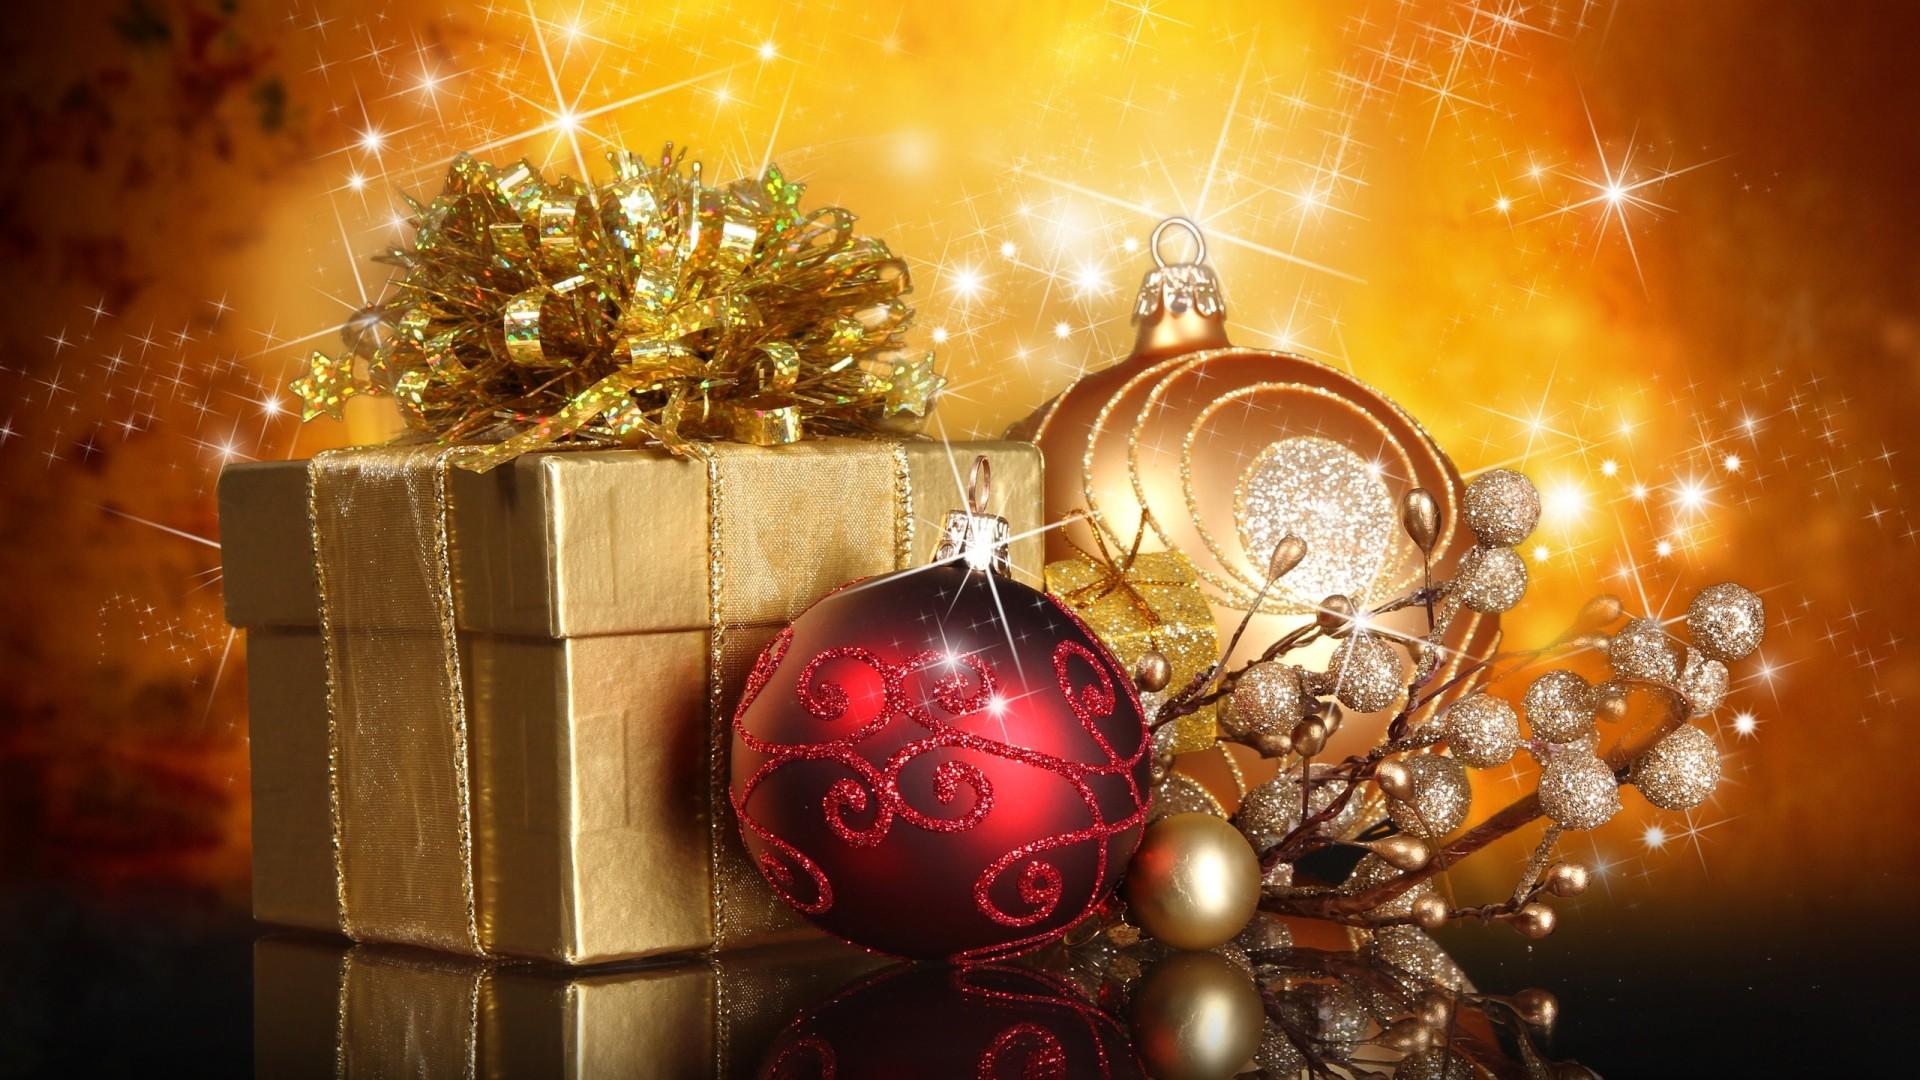 hd wallpaper christmas gifts and globes wallpaper